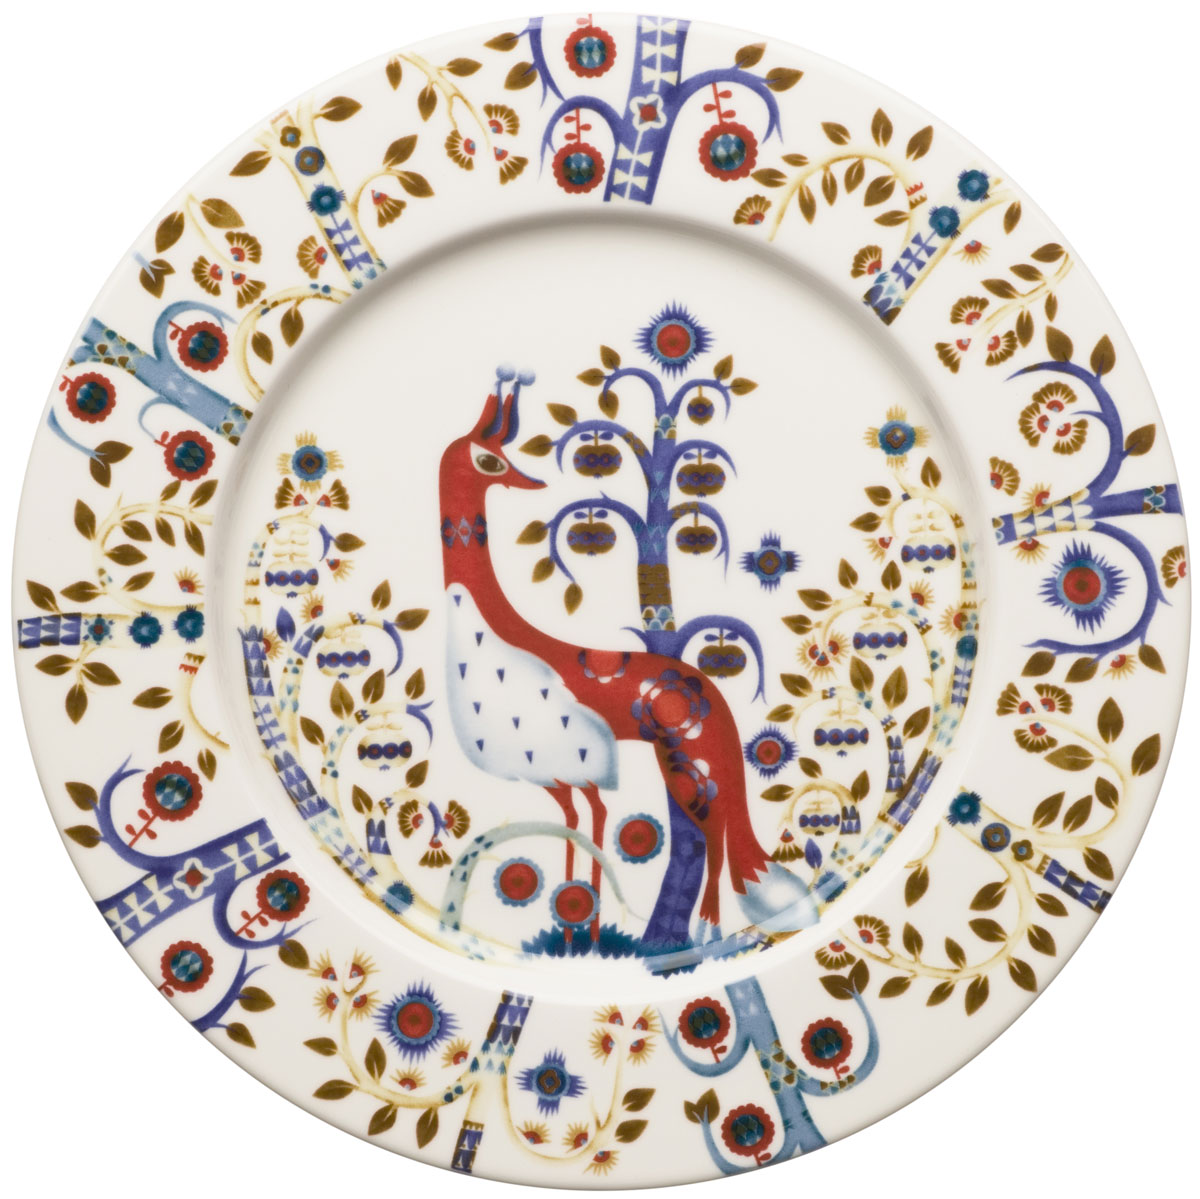 Тарелка Iittala Taika, цвет: белый, диаметр 22 см1012440